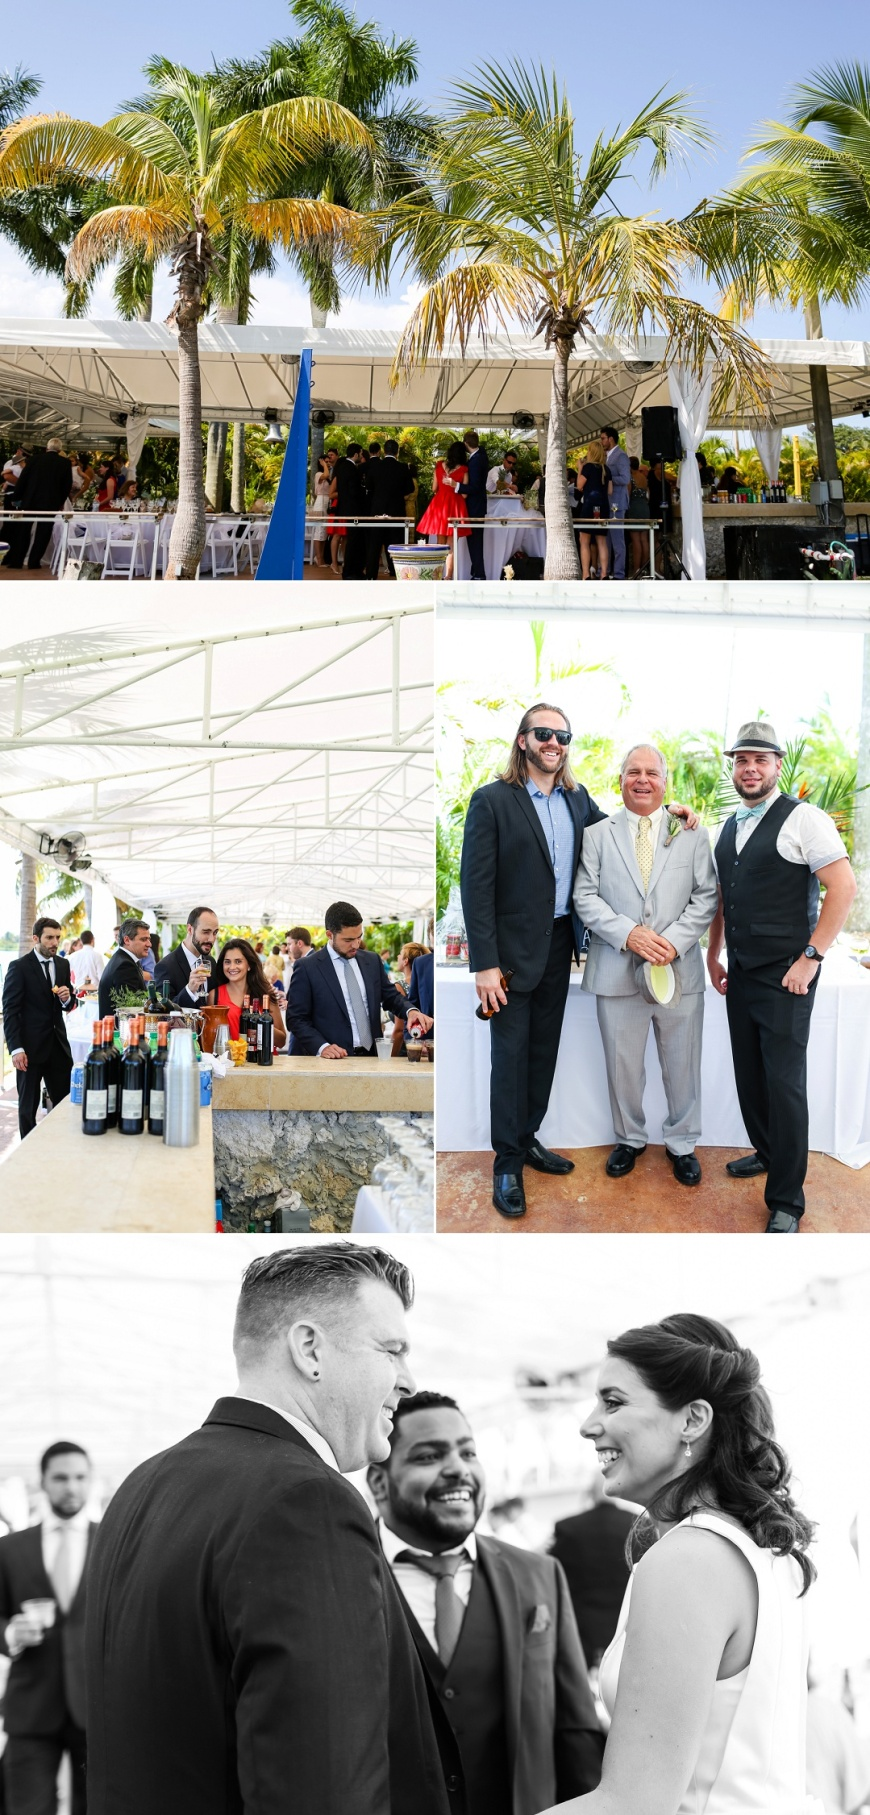 Royal-Palm-Island-Miami-Wedding-Photographer_1054.jpg